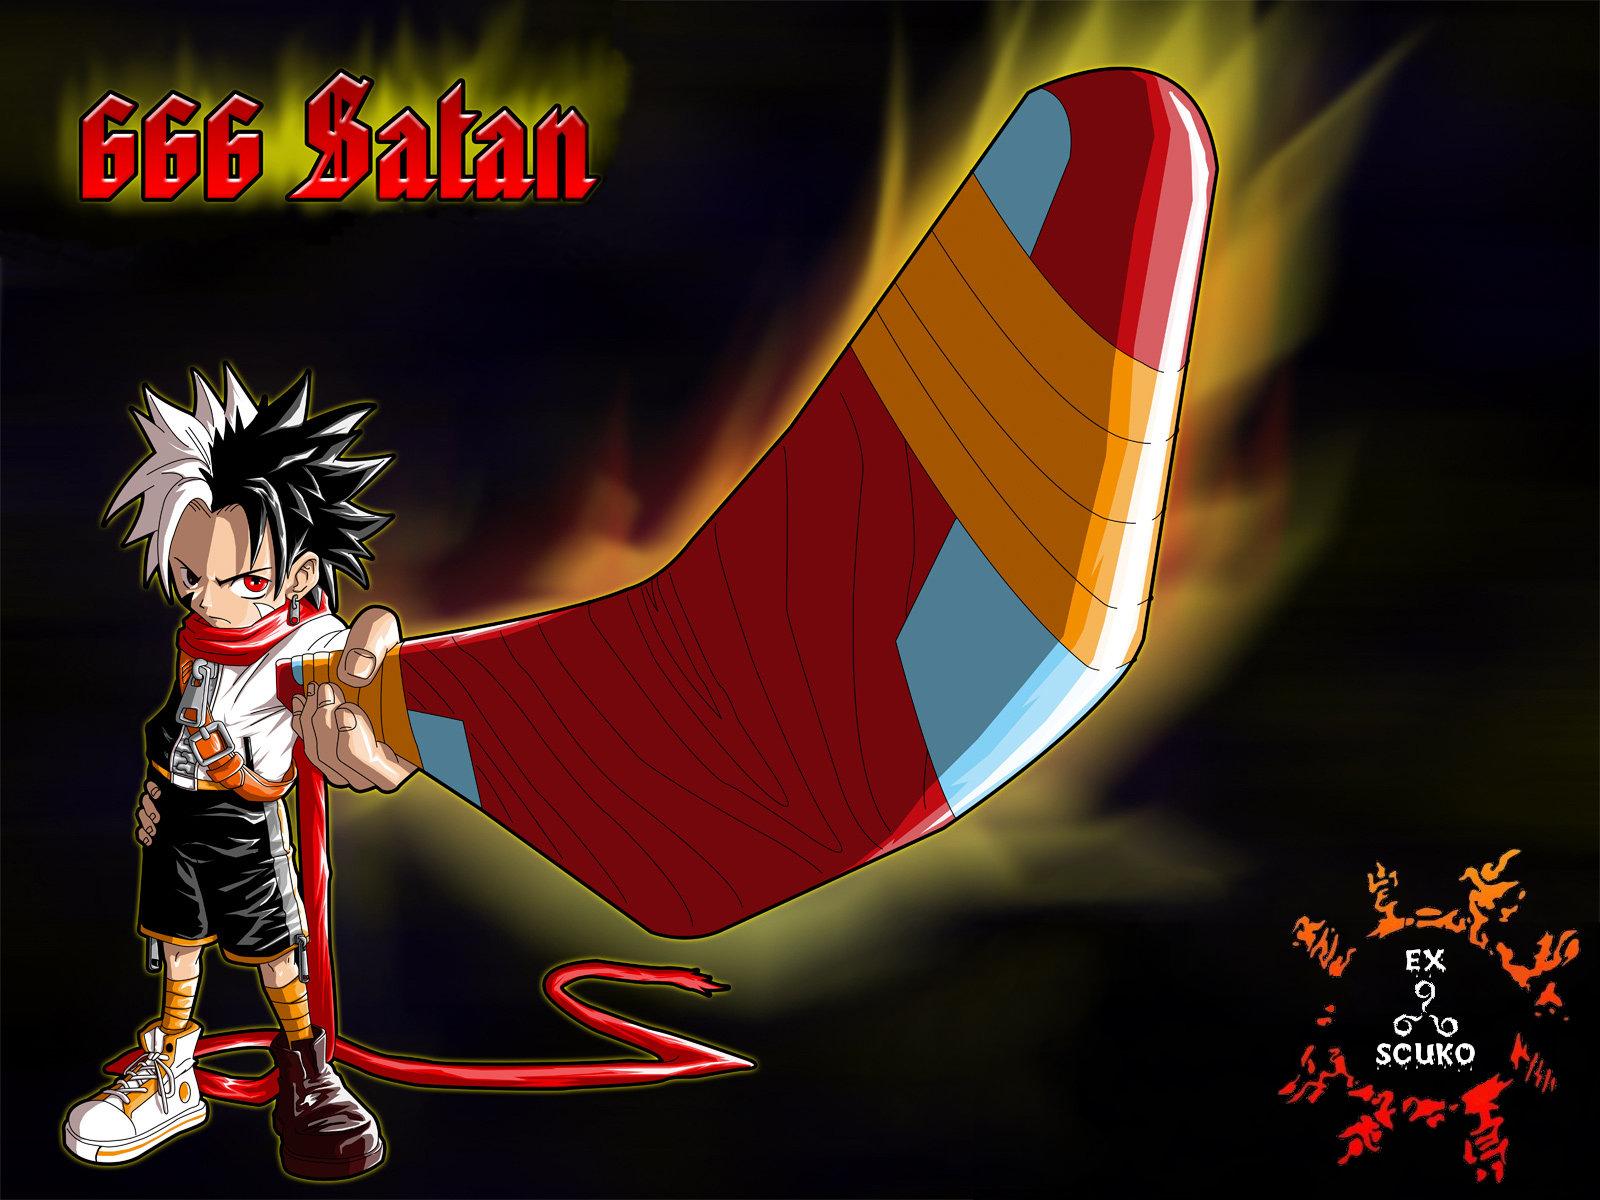 Манга Онлайн - 666 Satan / 666 Сатана 11 # 42 Соперник !? - Страница №1 - 666 Satan